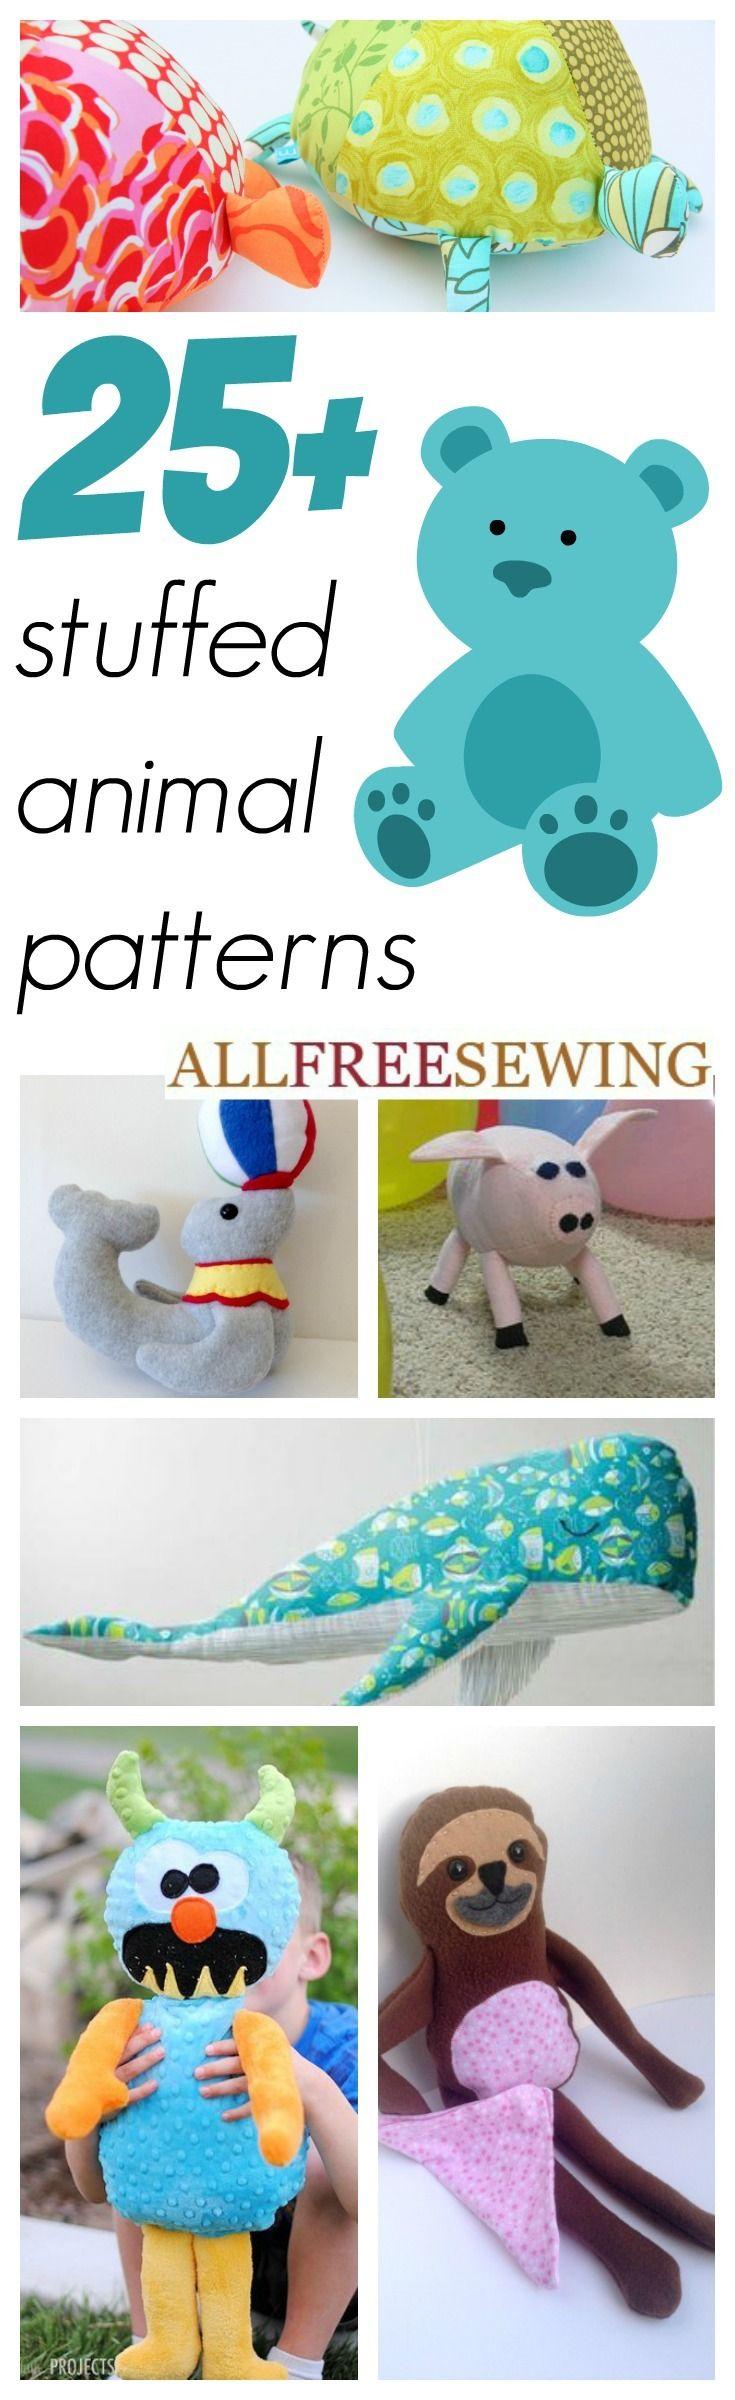 Mas de 25 patrones de animales de peluche   -   25+ Easy Stuffed Animal Patterns